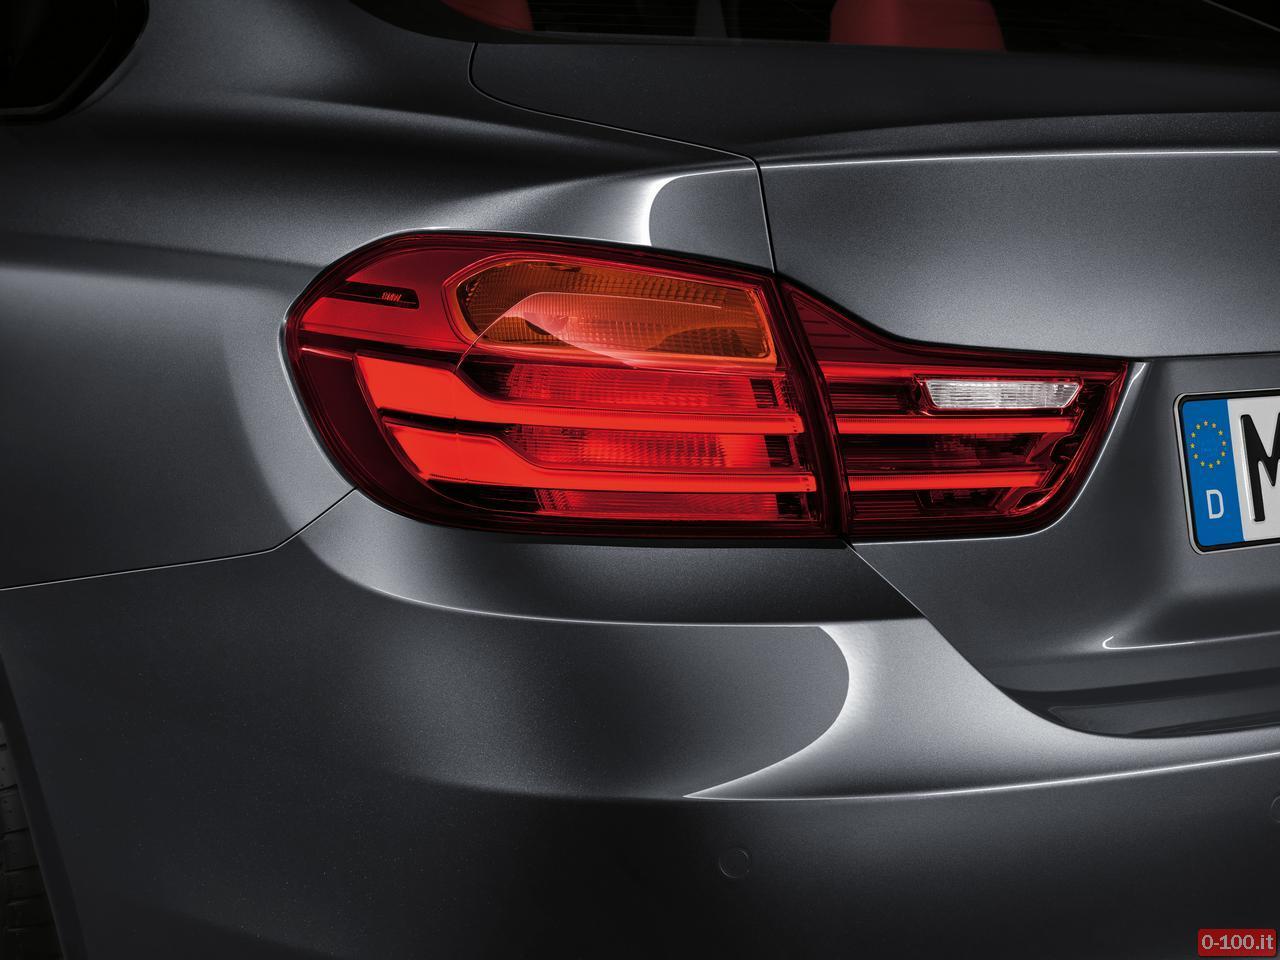 bmw_serie-4-coupé_0-100_76